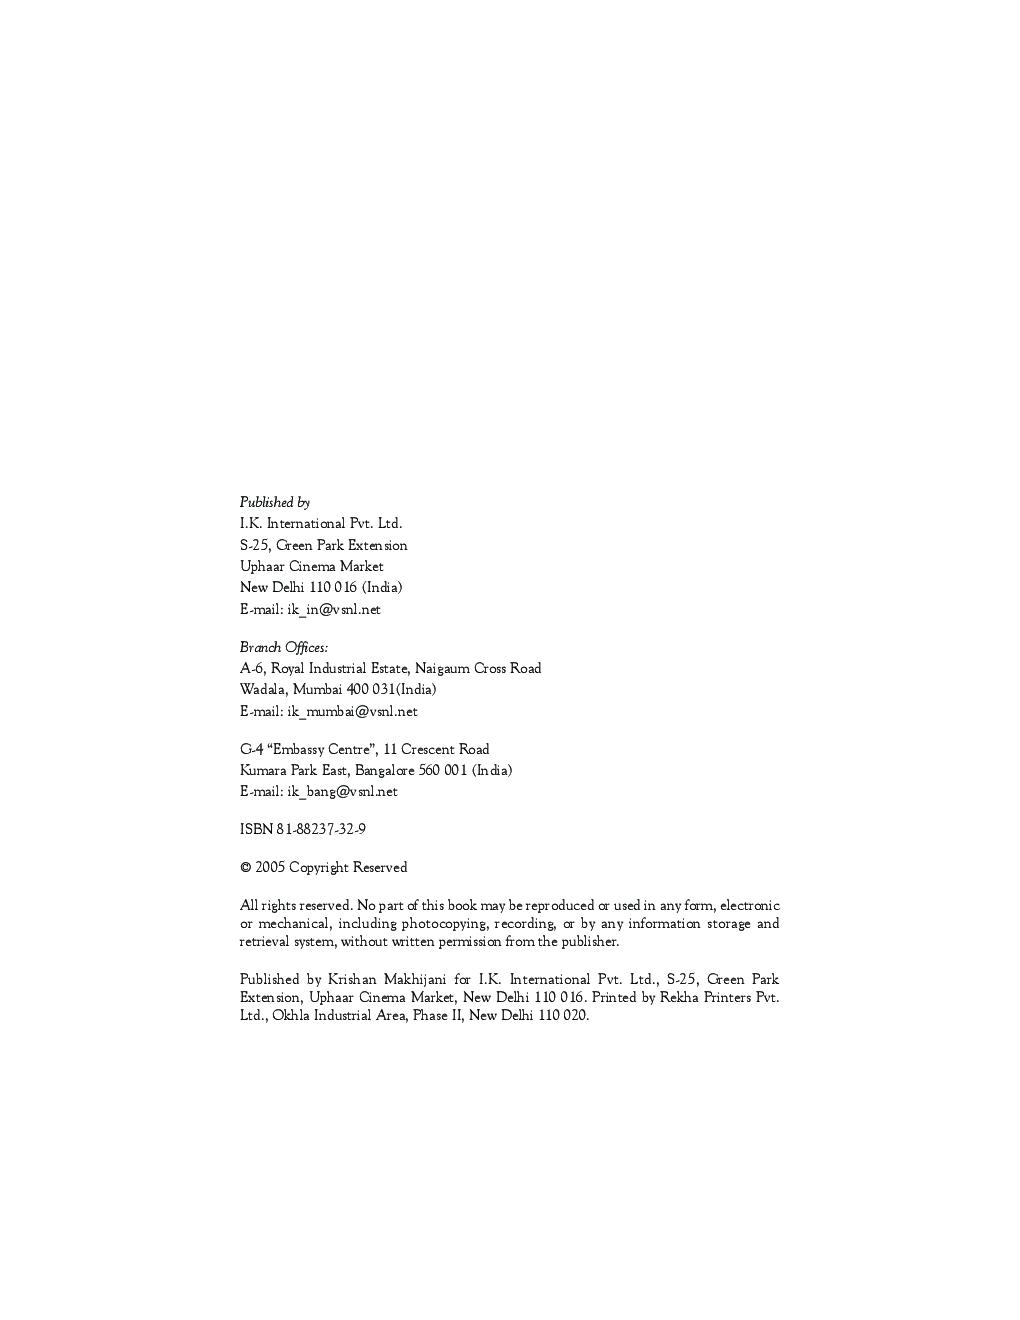 Download Laboratory Techniques In Organic Chemistry by V  K  Ahluwalia ,  Pooja Bhagat, Renu Aggarwal PDF Online